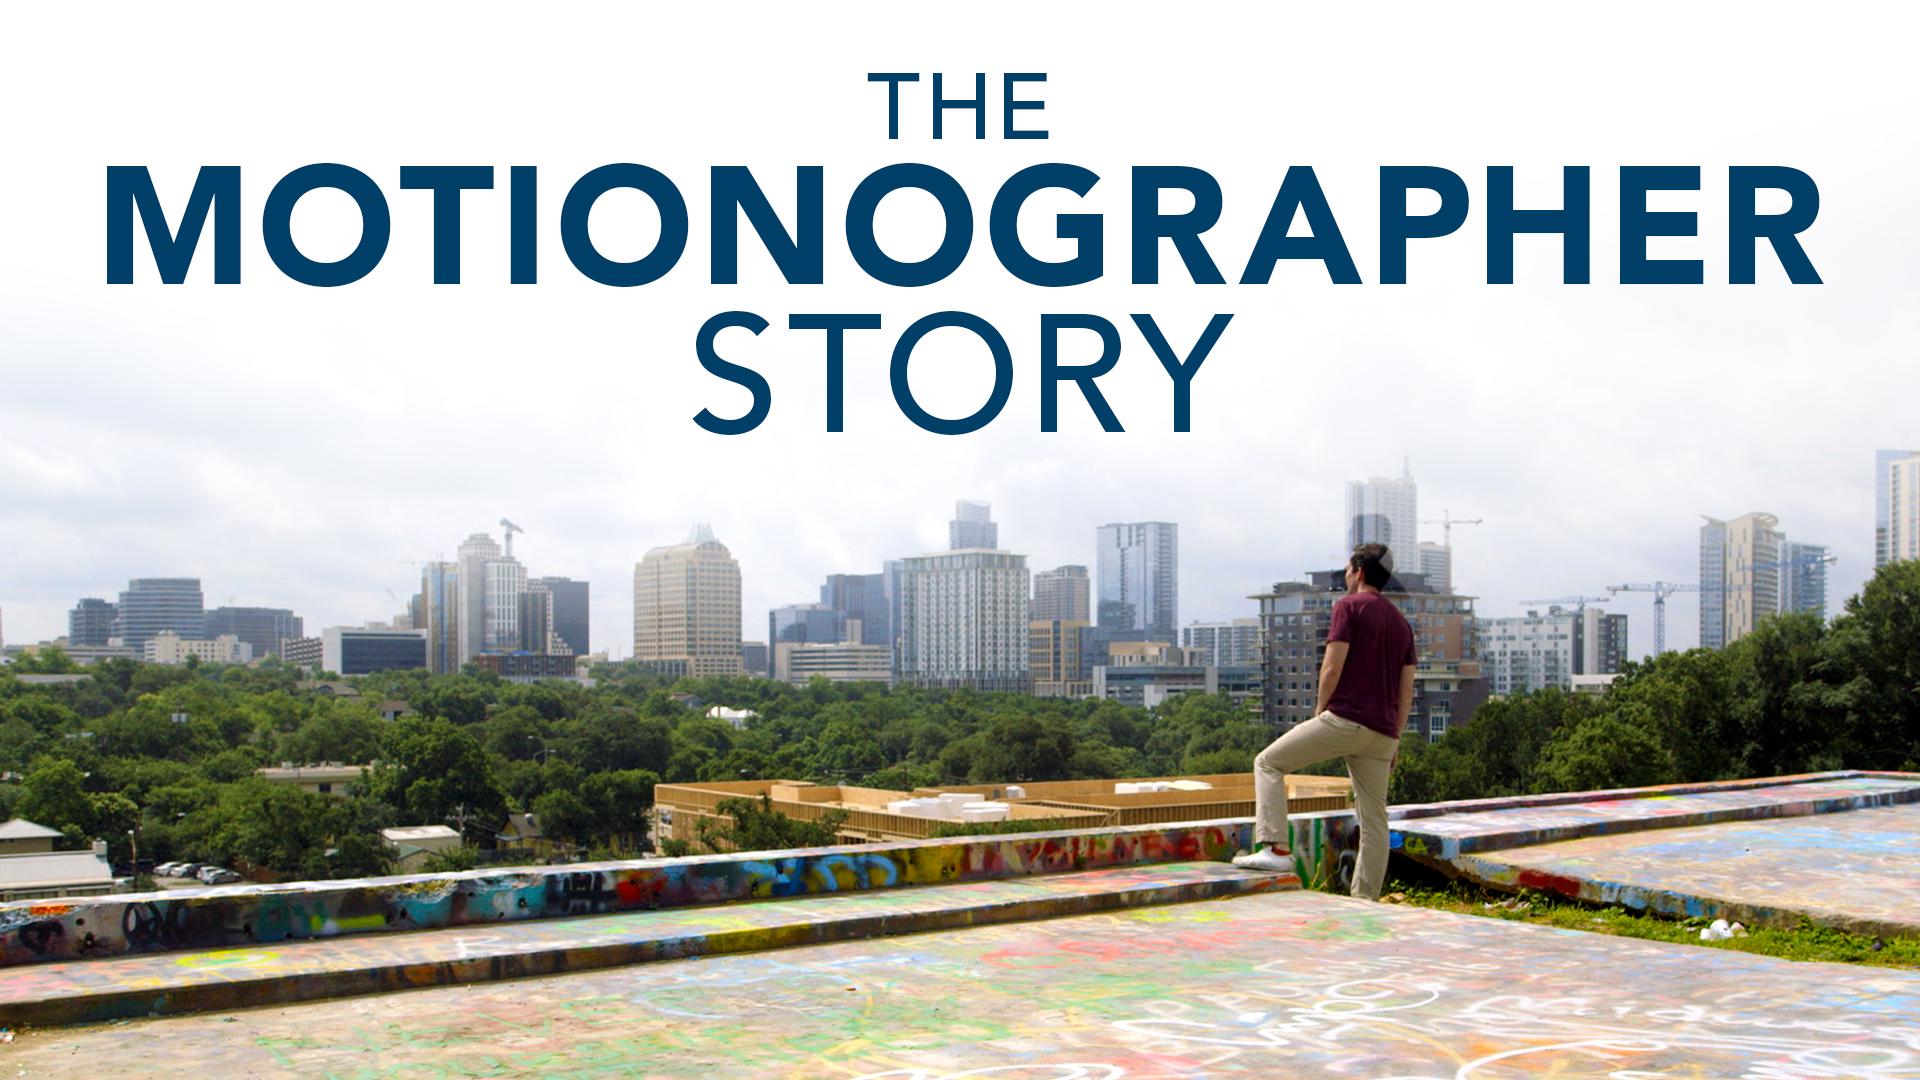 The Motionographer Story: The Motionographer Story